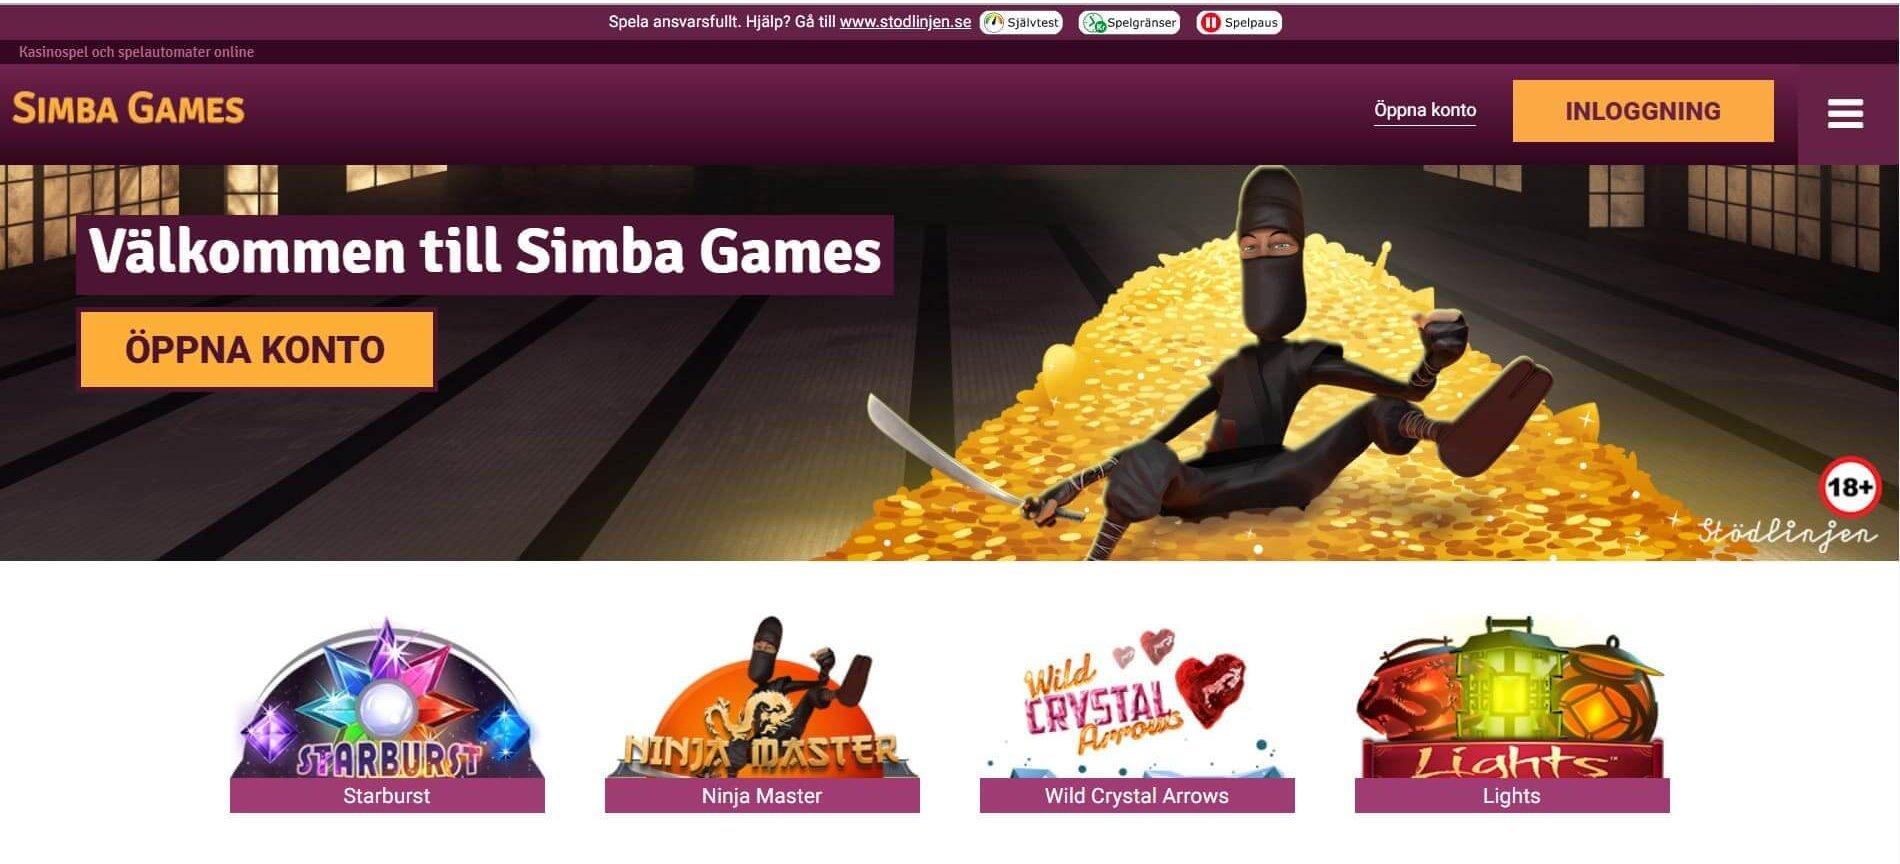 Simba Games har en annorlunda startsida